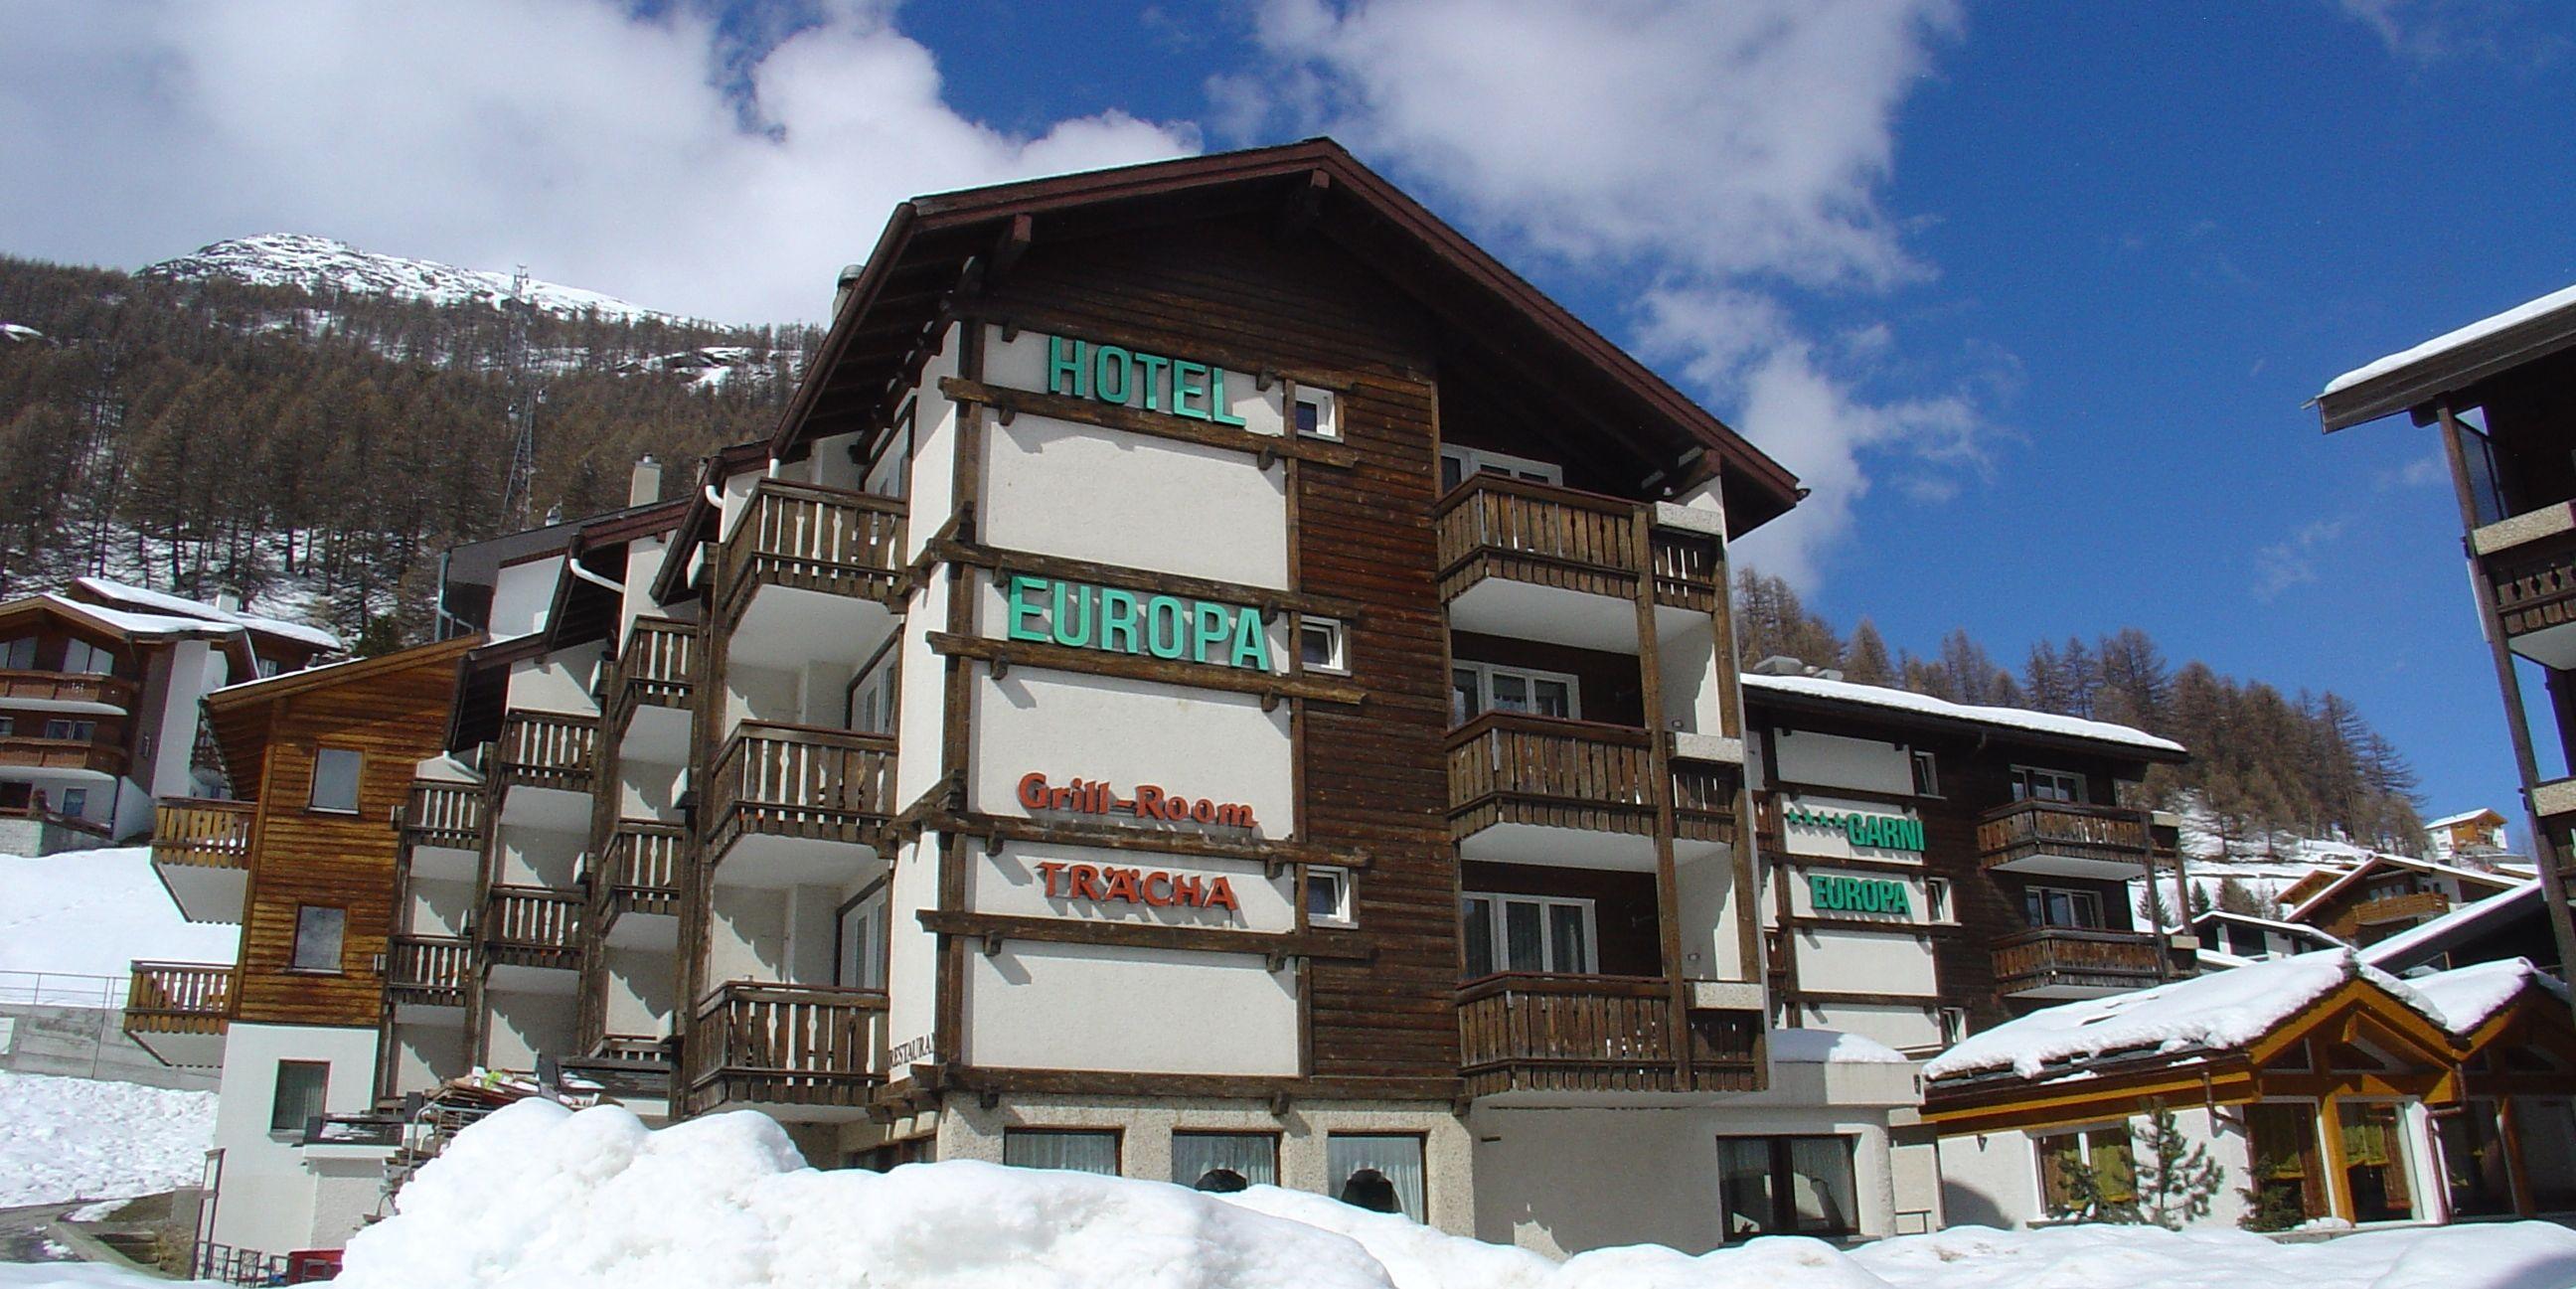 Hotel Europa - Freie Ferienrepublik Saas-Fee